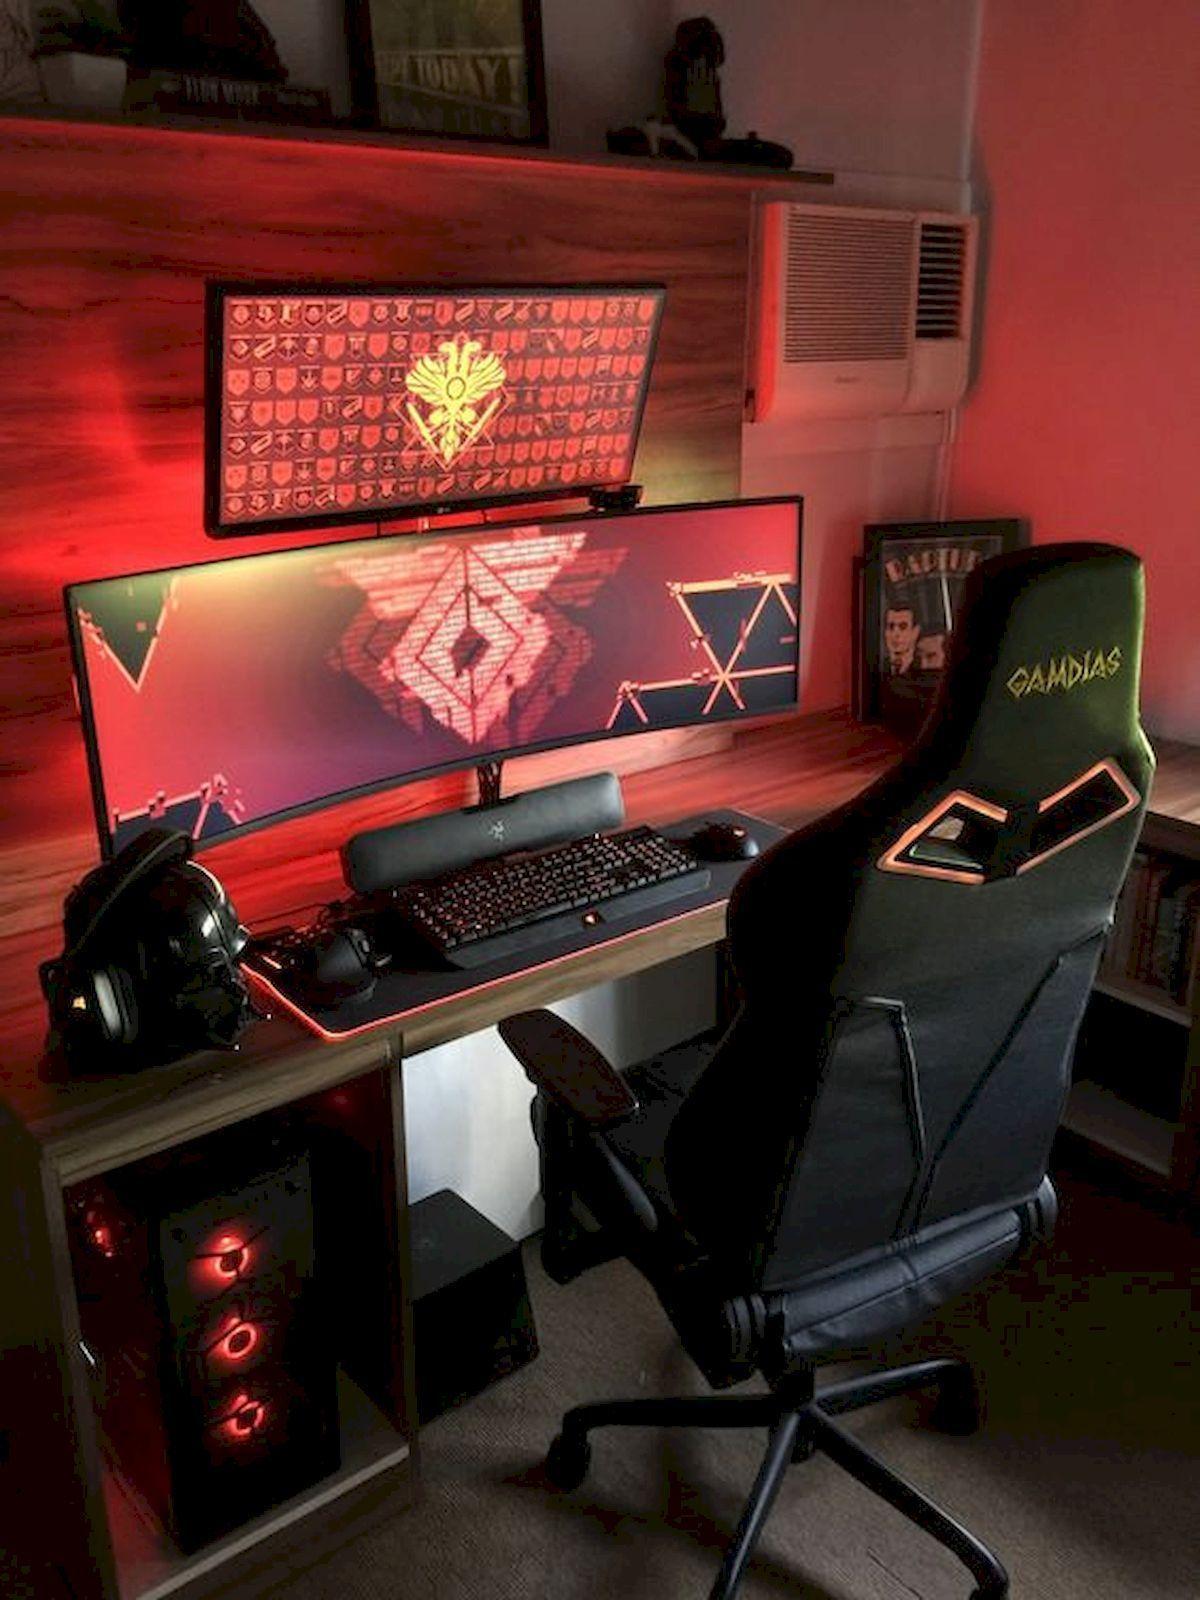 60 Magical Diy Computer Desk Gaming Design Ideas And Decor 22